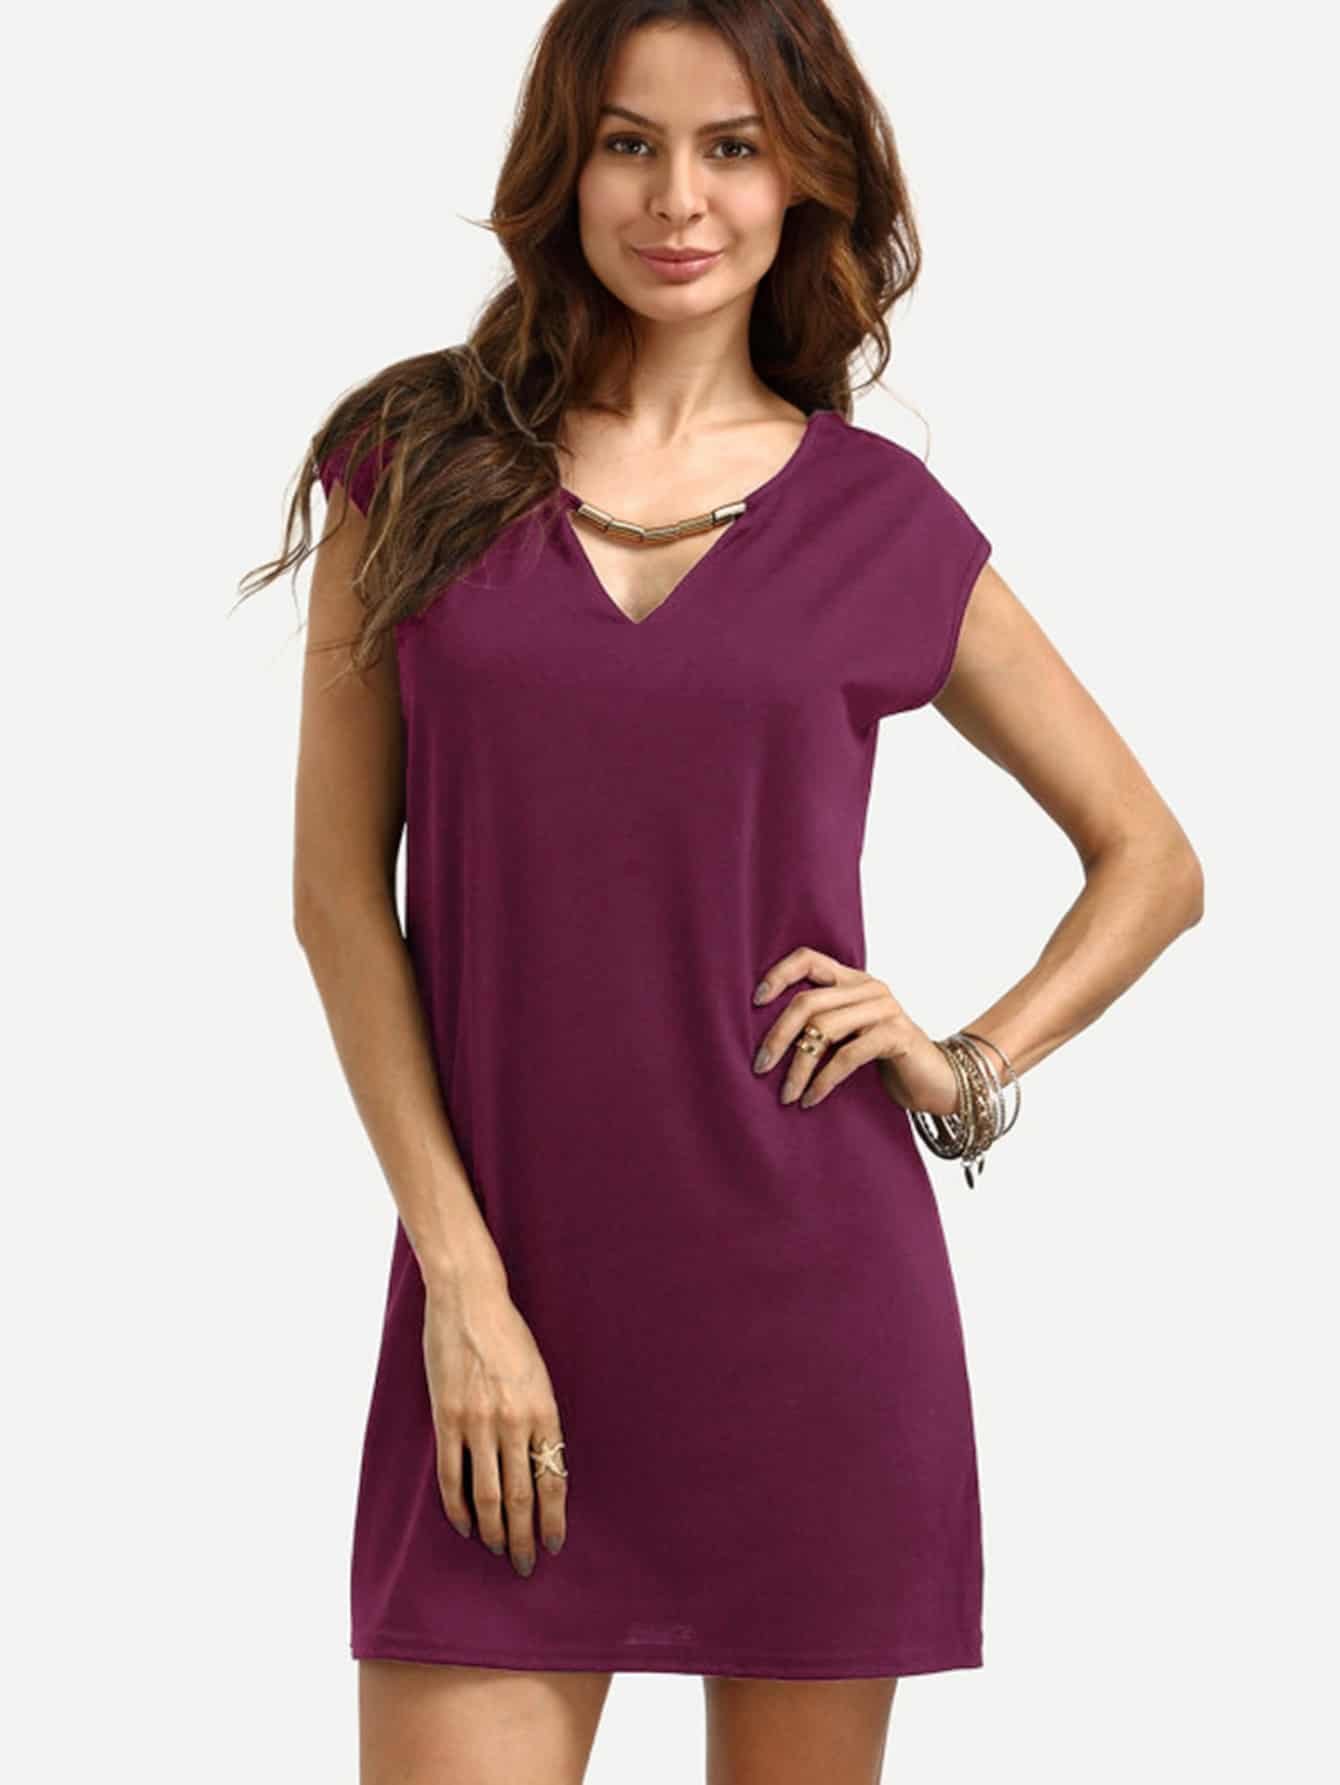 V Cut Cap Sleeve Dress With Metal Bar Detail v notch pearl leaf chain detail fluted sleeve dress